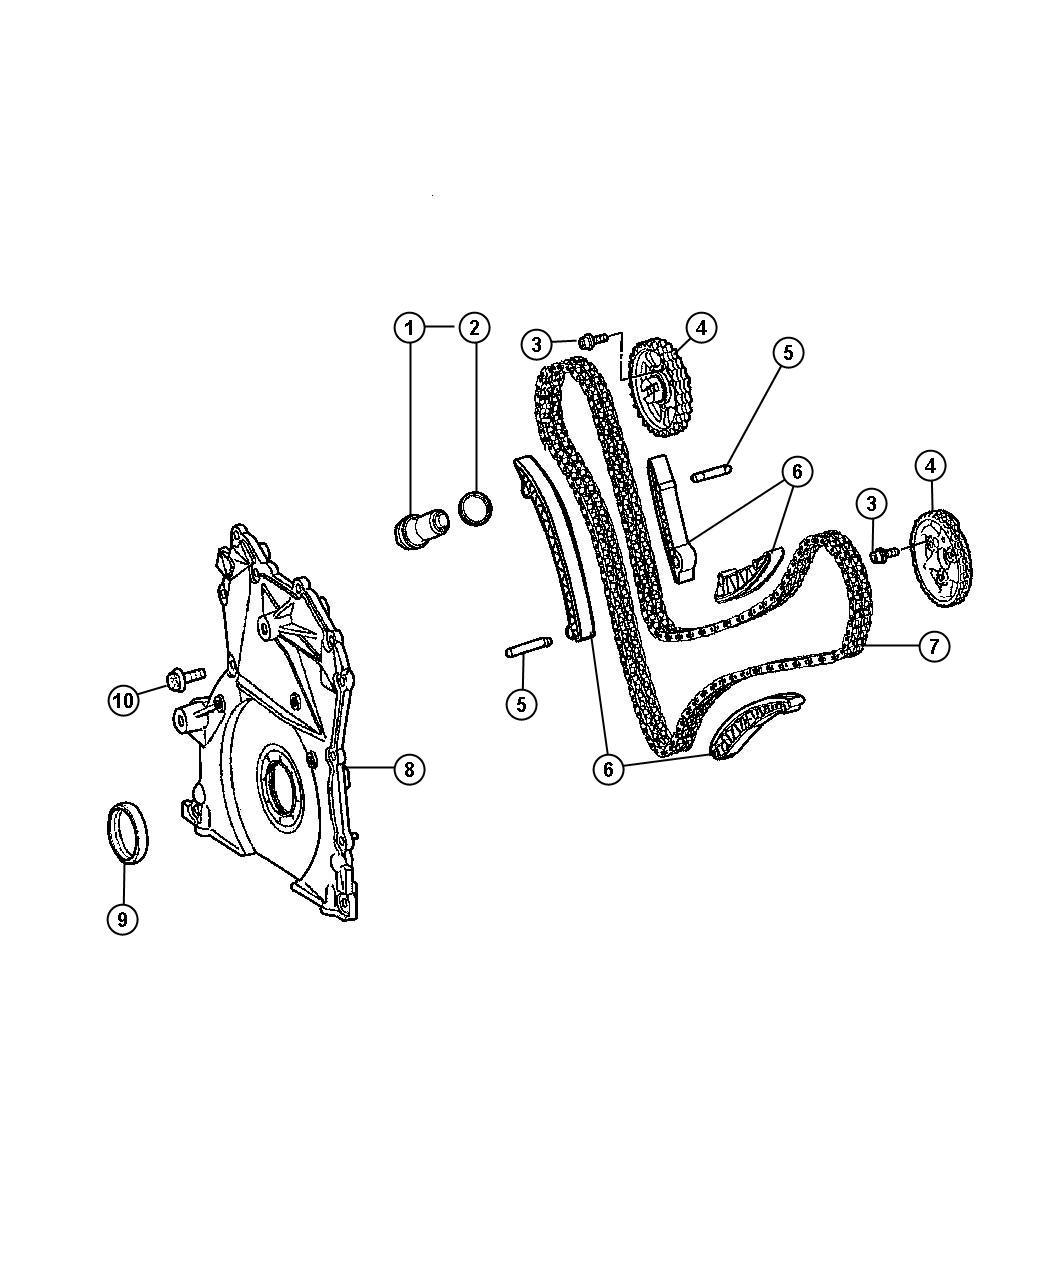 2008 Jeep Grand Cherokee Chain. Timing. Diesel, engine